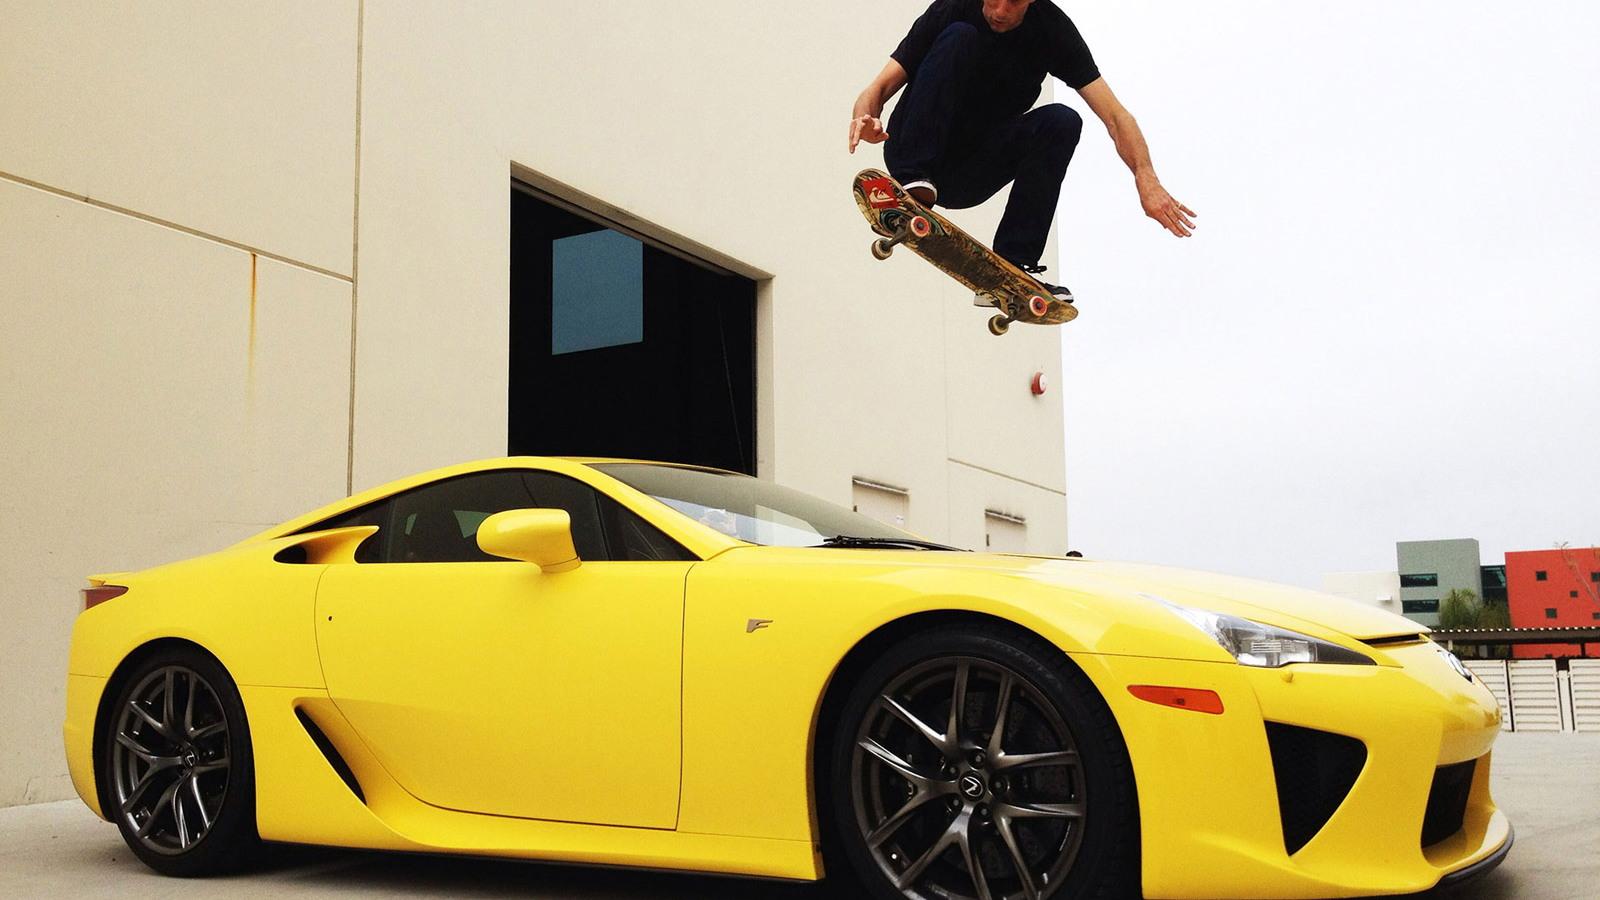 Tony Hawk jumping over an LFA supercar loaned to him by Lexus